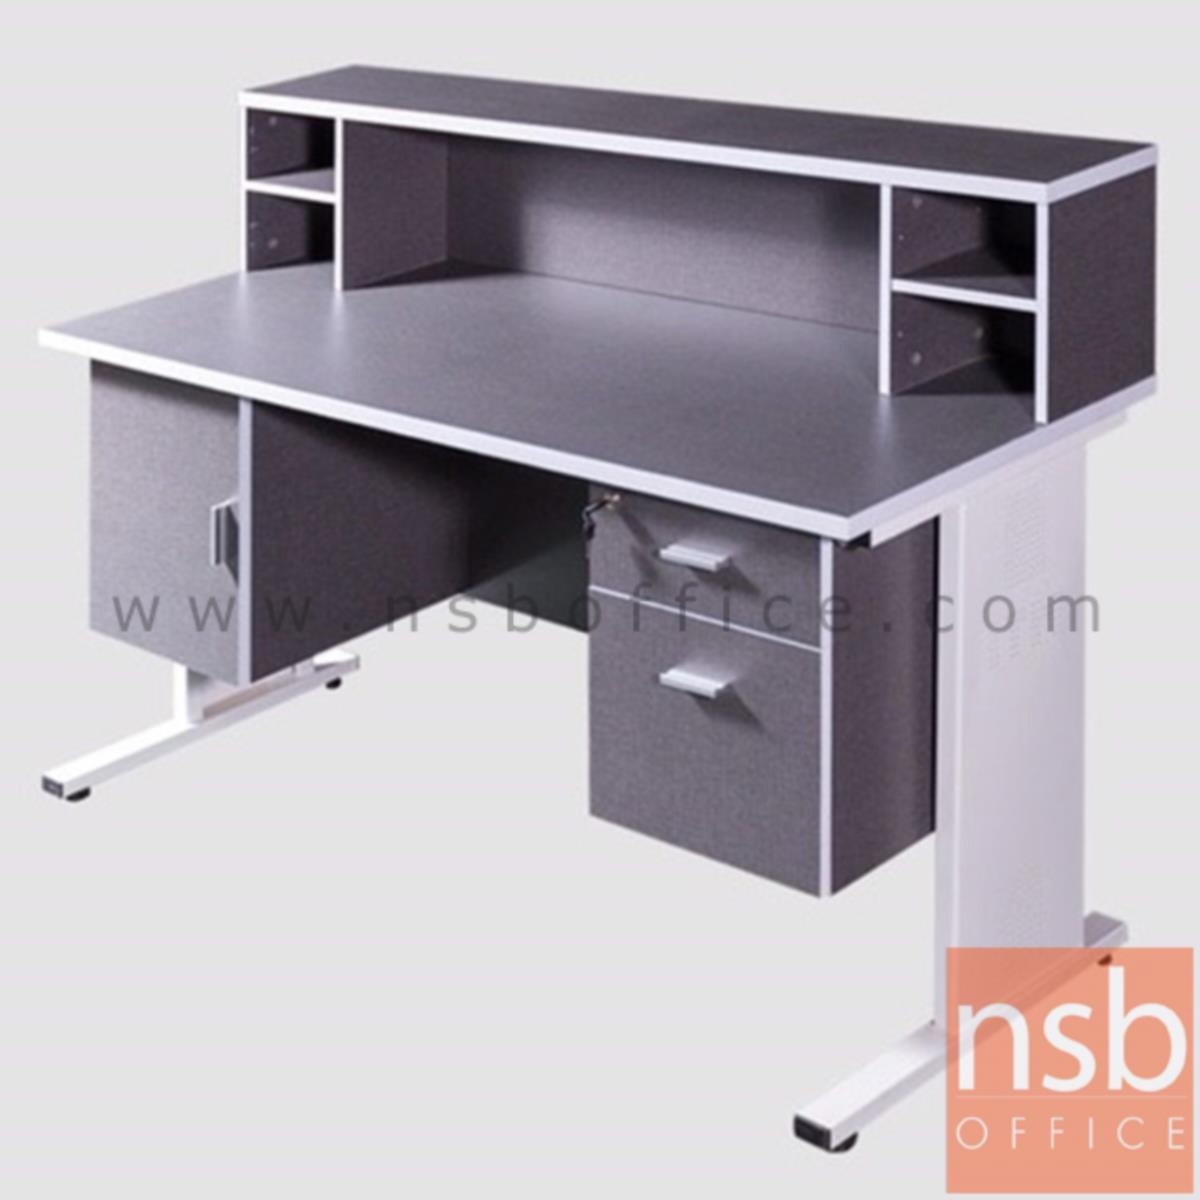 A11A082:โต๊ะเคาน์เตอร์หน้าตรง 2 ลิ้นชัก 1 บานเปิด รุ่น Advance (แอดวานส์) ขนาด 150W cm. ขาเหล็ก